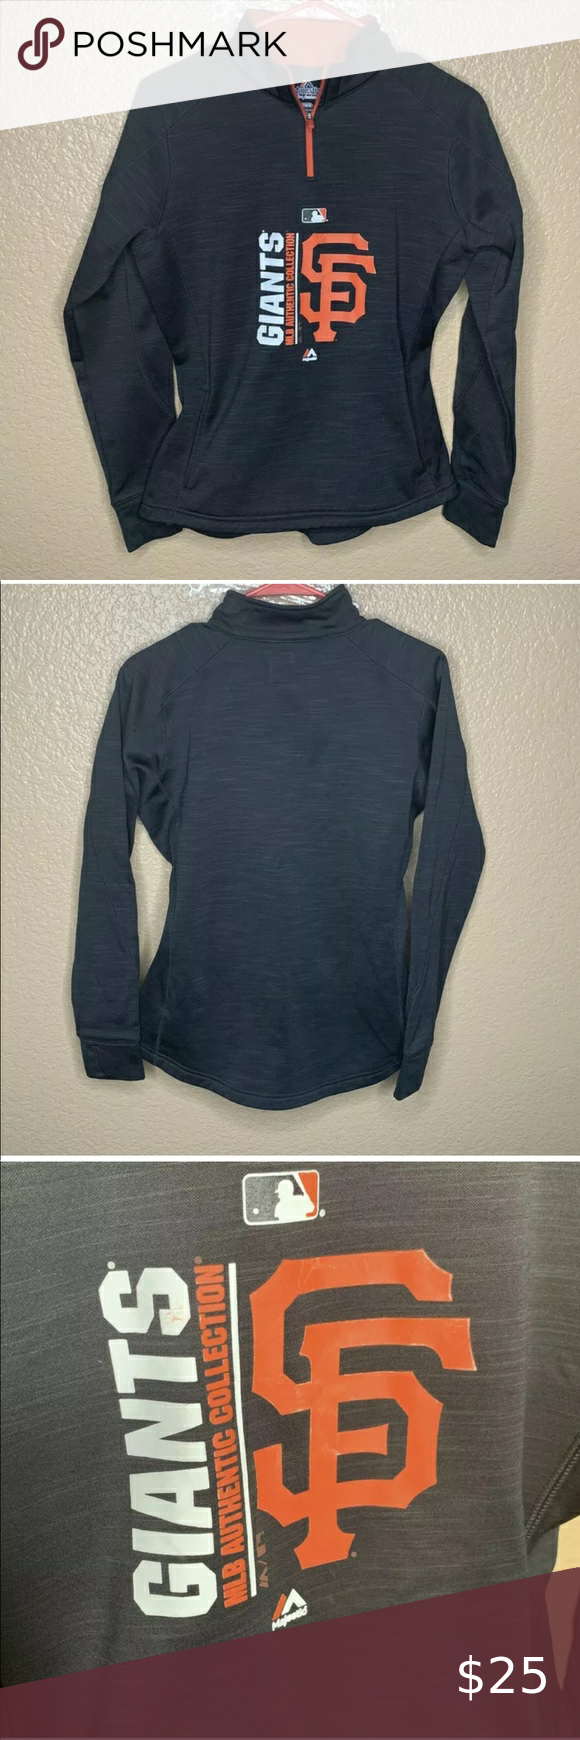 San Francisco Giants Women Zipup Medium Sweatshirt Great Pullover With Thumbholes And 1 4 Zip Smoke Free Sweatshirts Pullover Sweaters Long Sleeve Tshirt Men [ 1740 x 580 Pixel ]